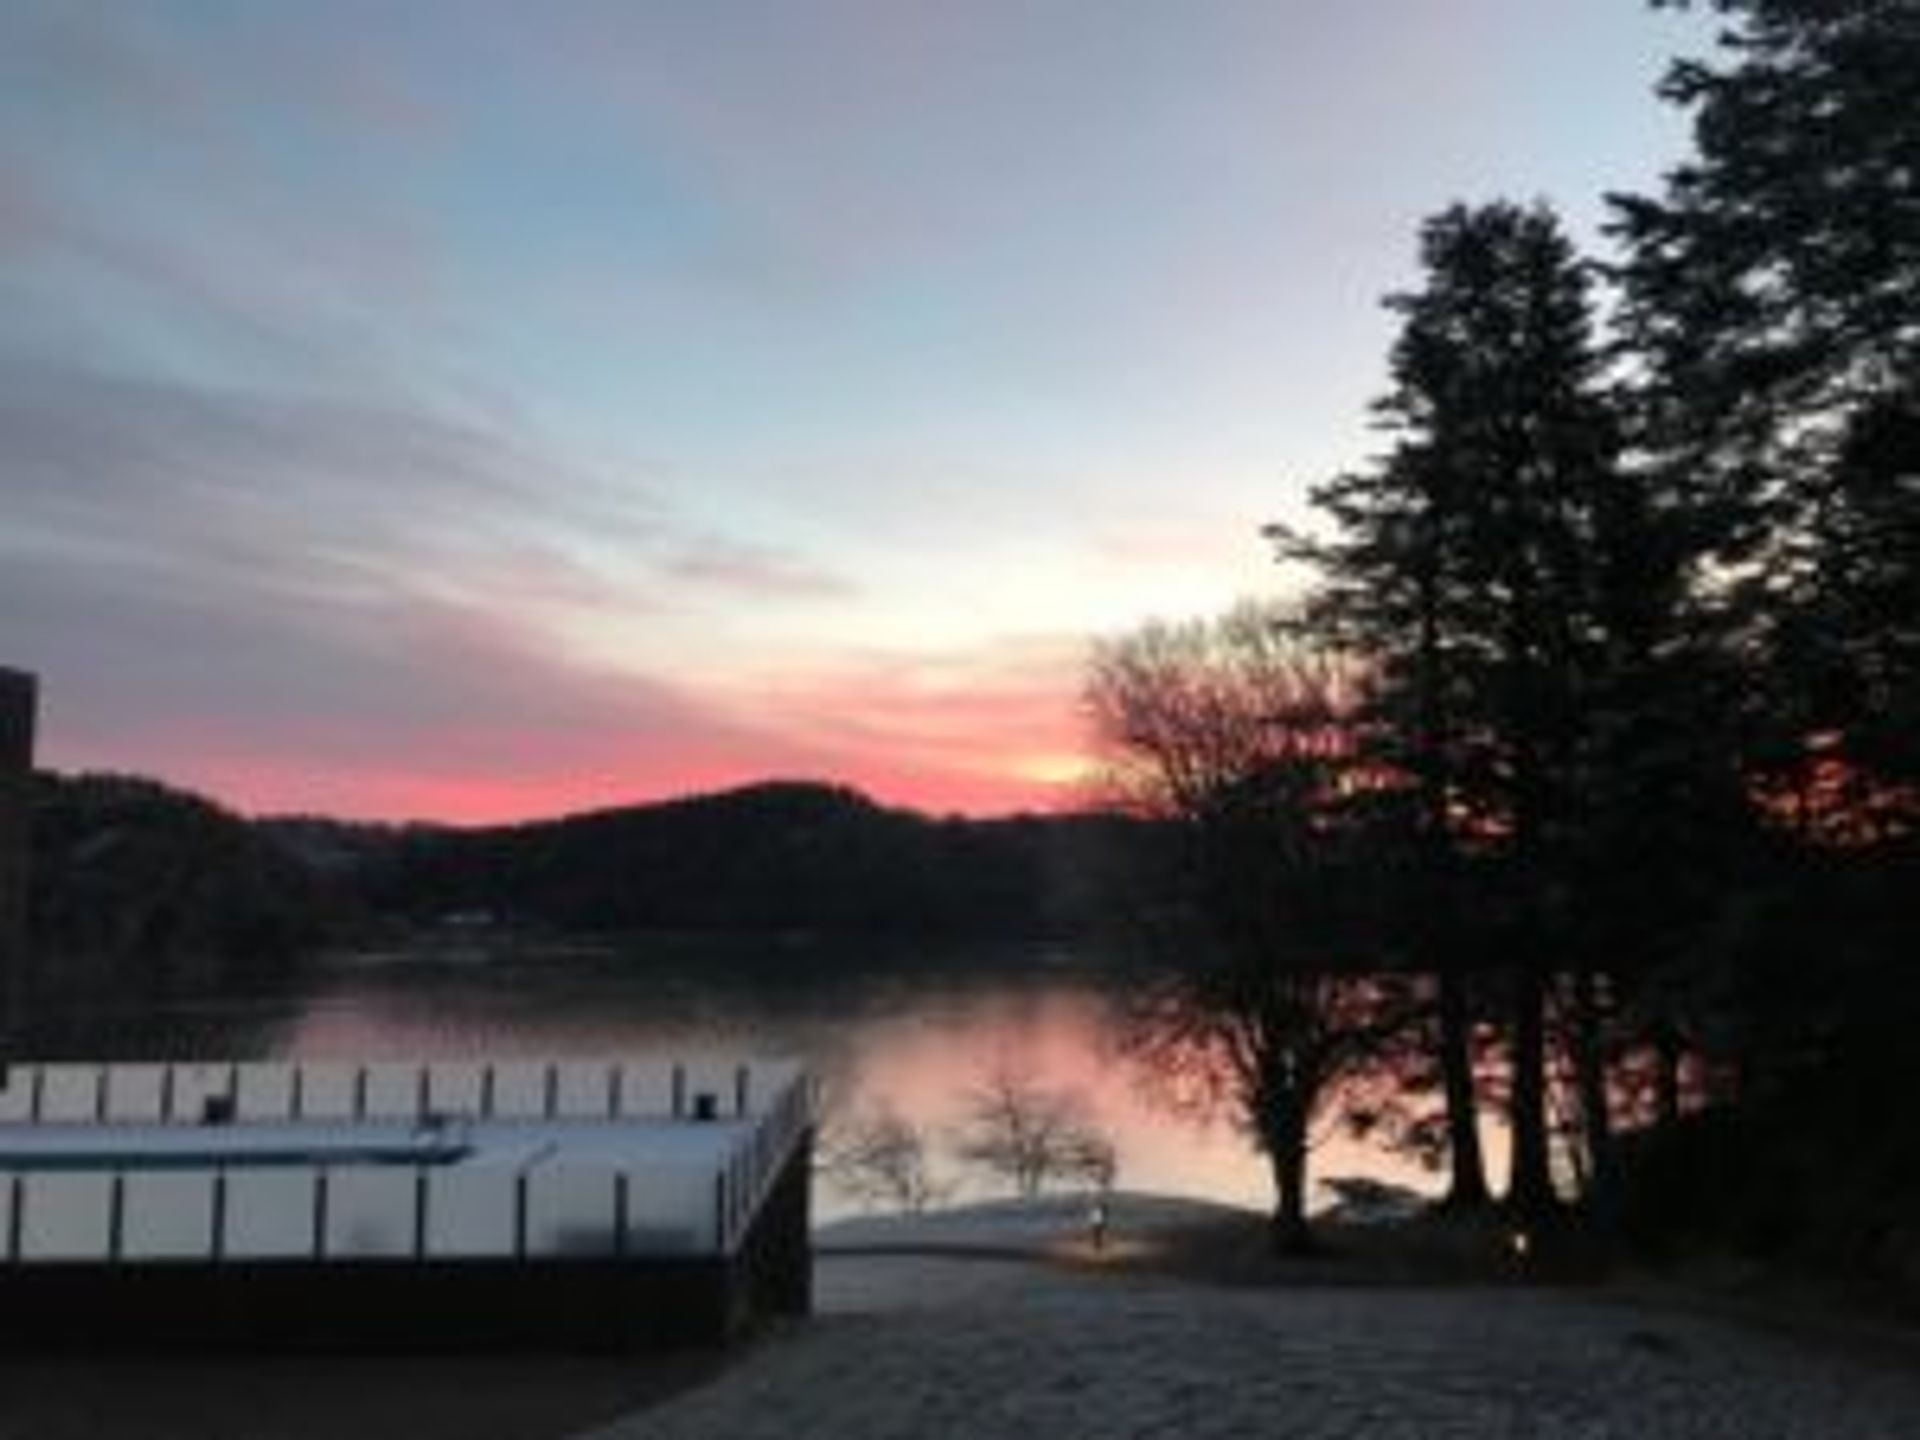 A pink sunrise.